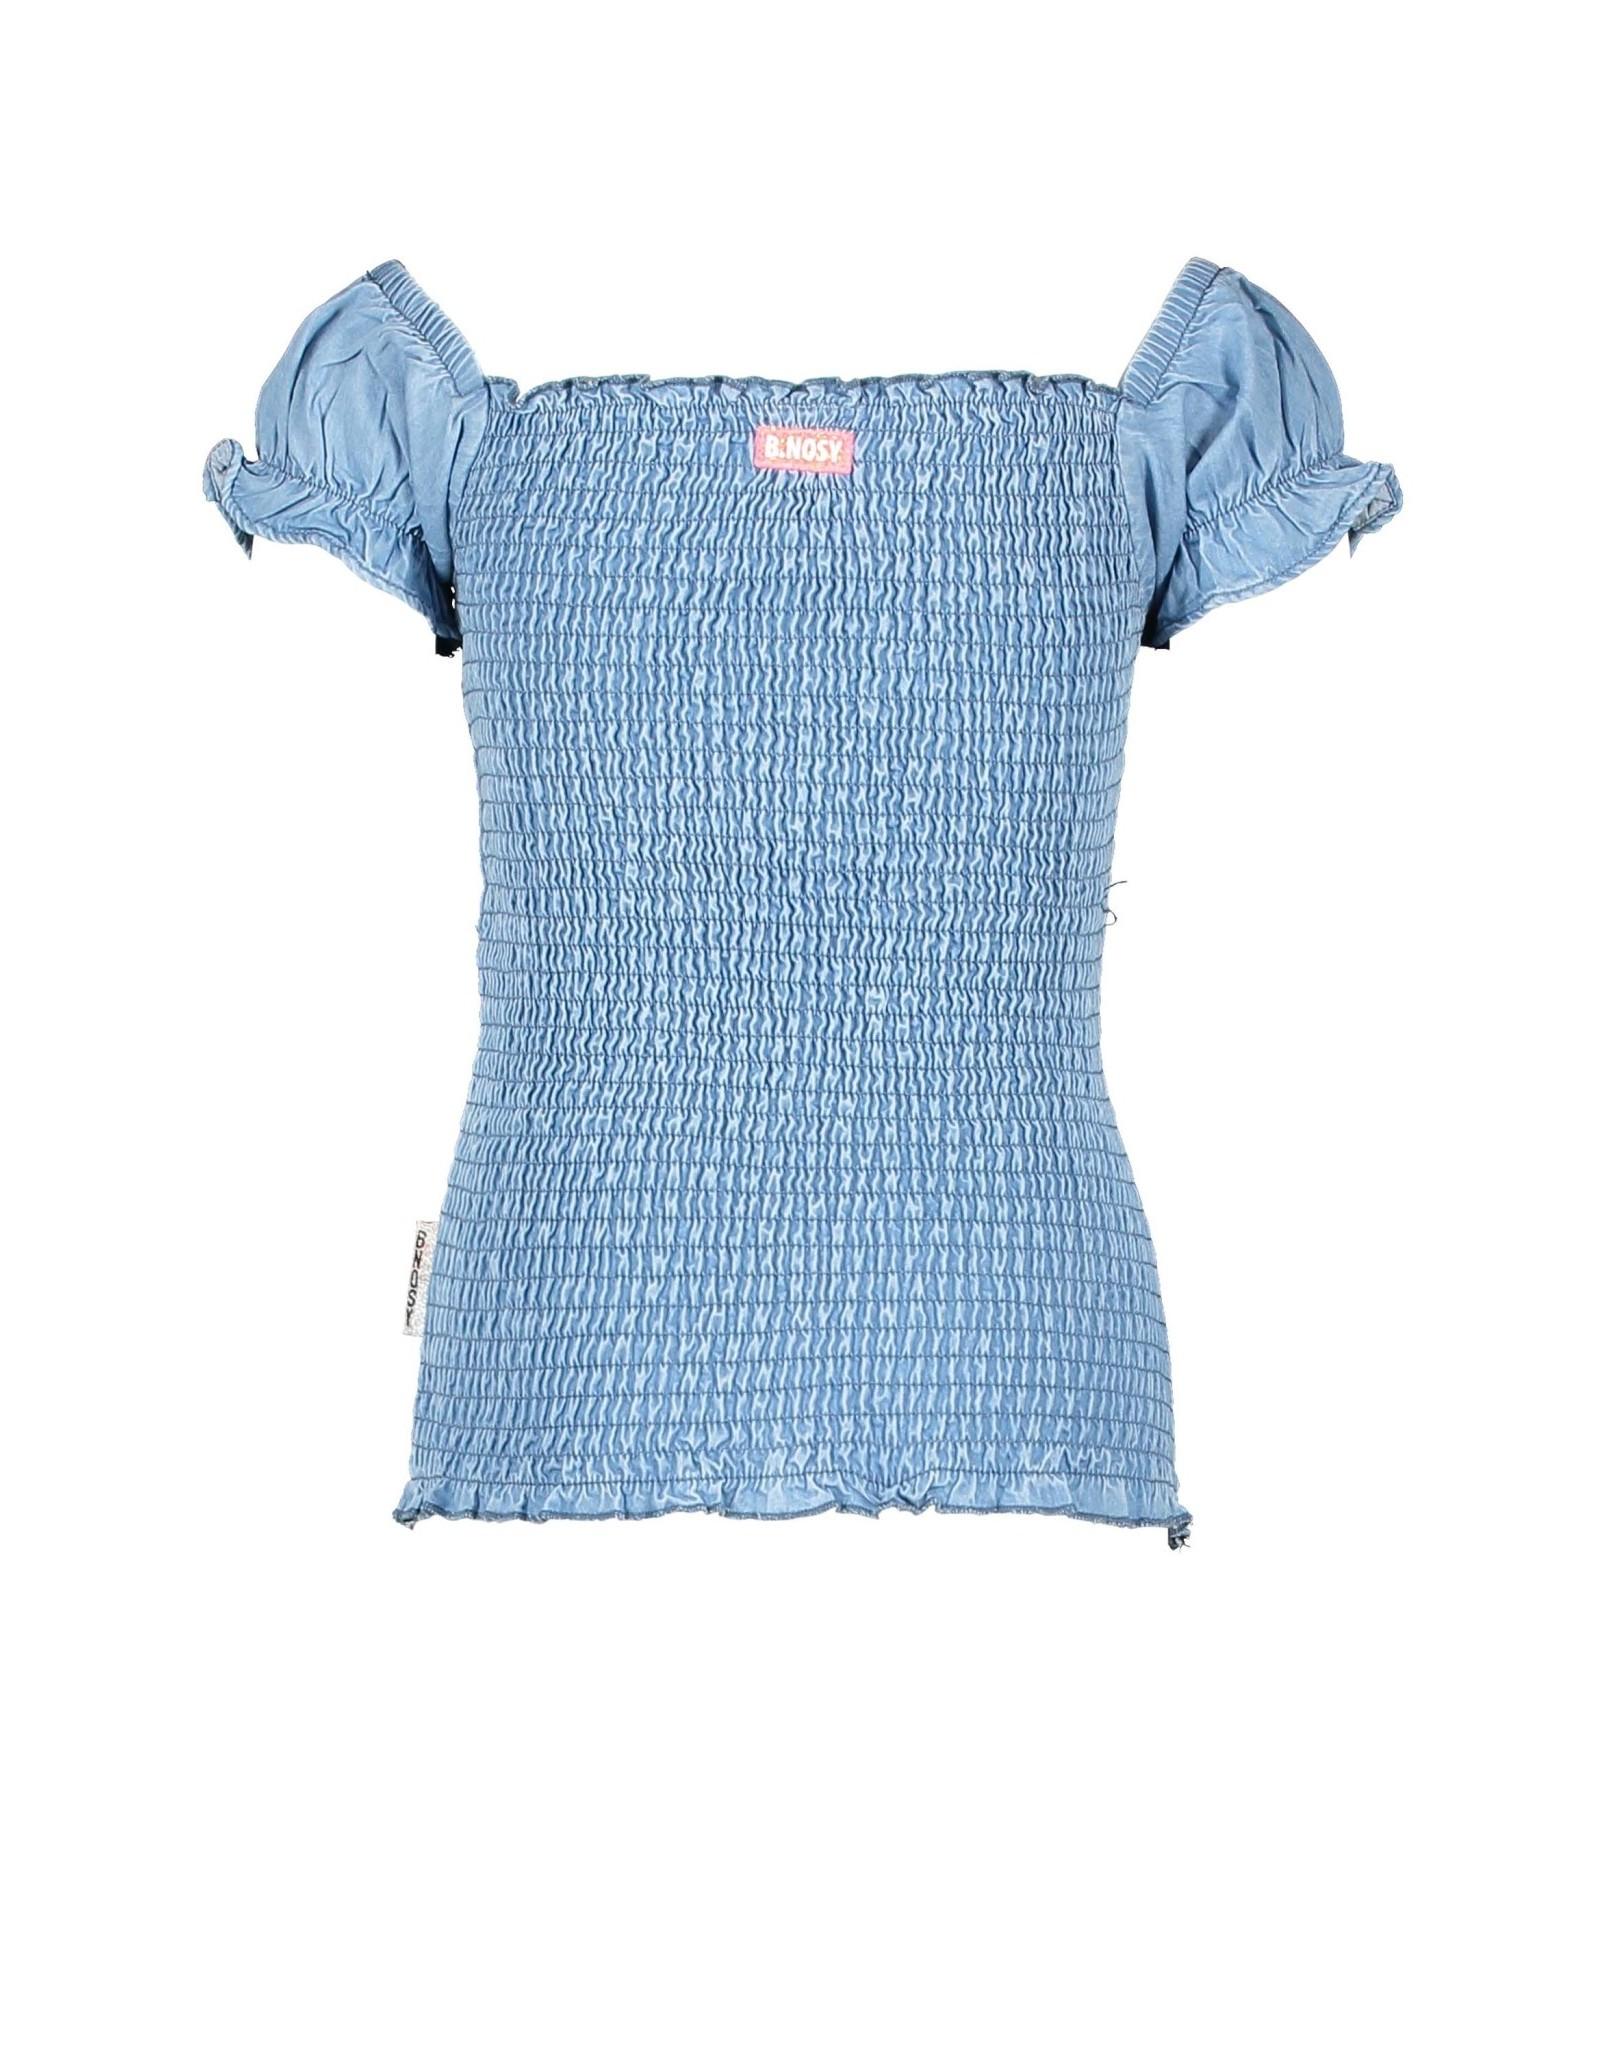 B.Nosy B.Nosy meisjes gesmokt t-shirt Curious Denim